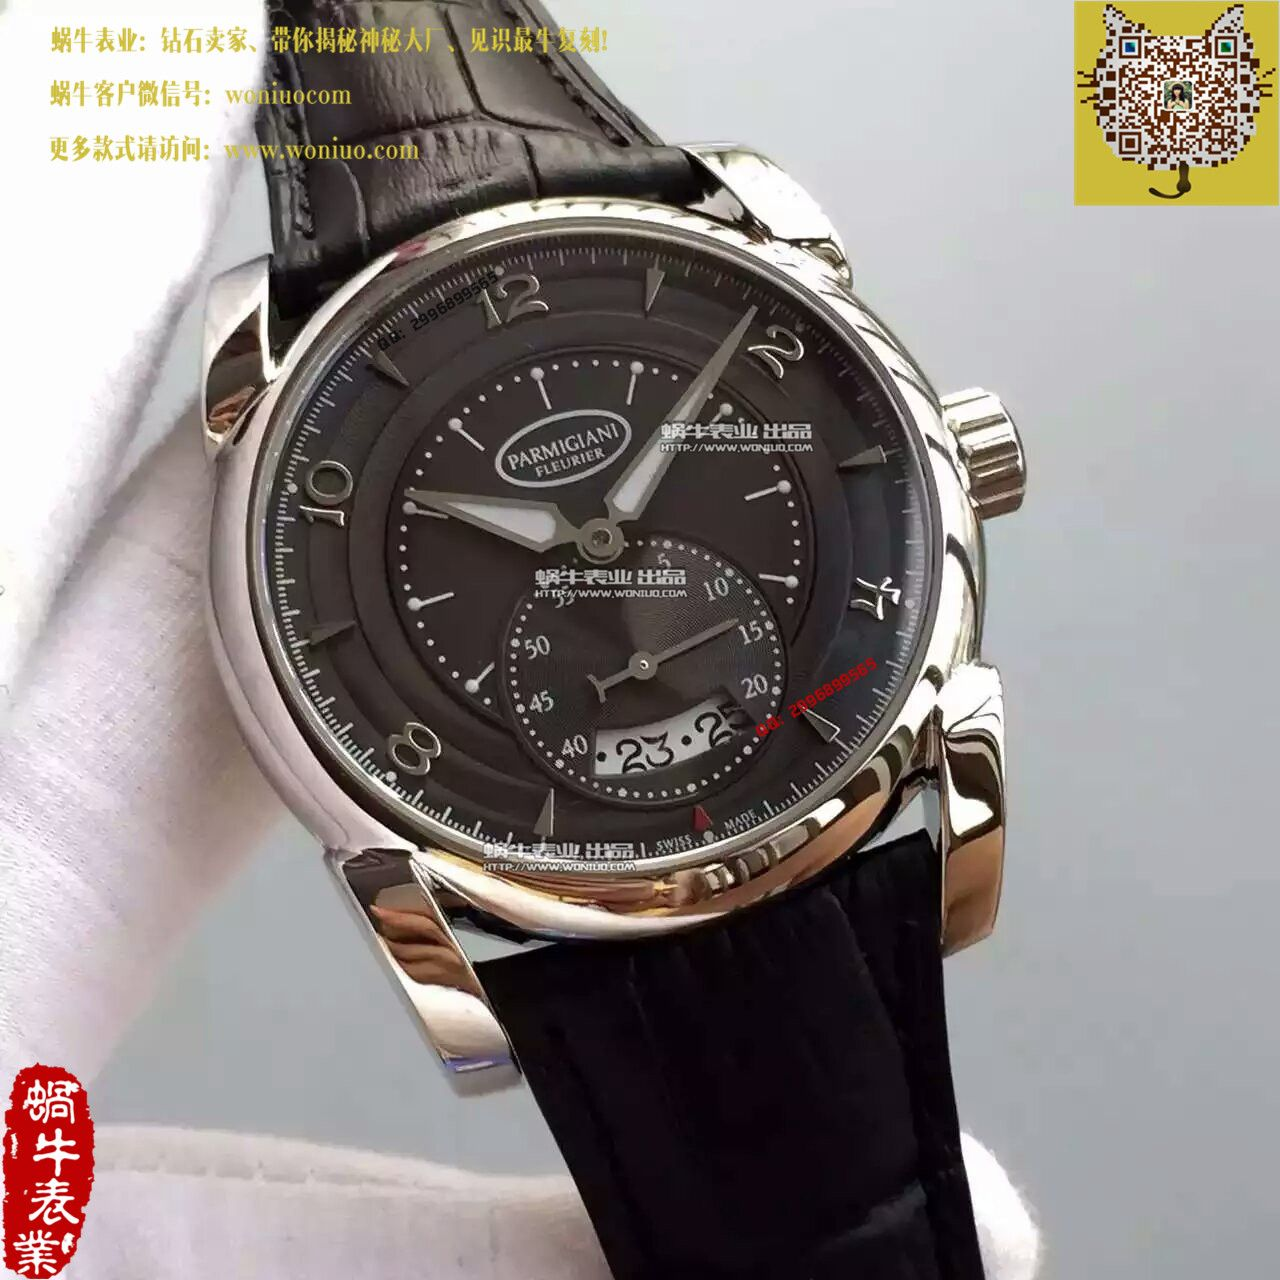 【TF厂1:1精仿手表】帕玛强尼Tonda系列PF012505.01 表经42mm腕表 / PM026